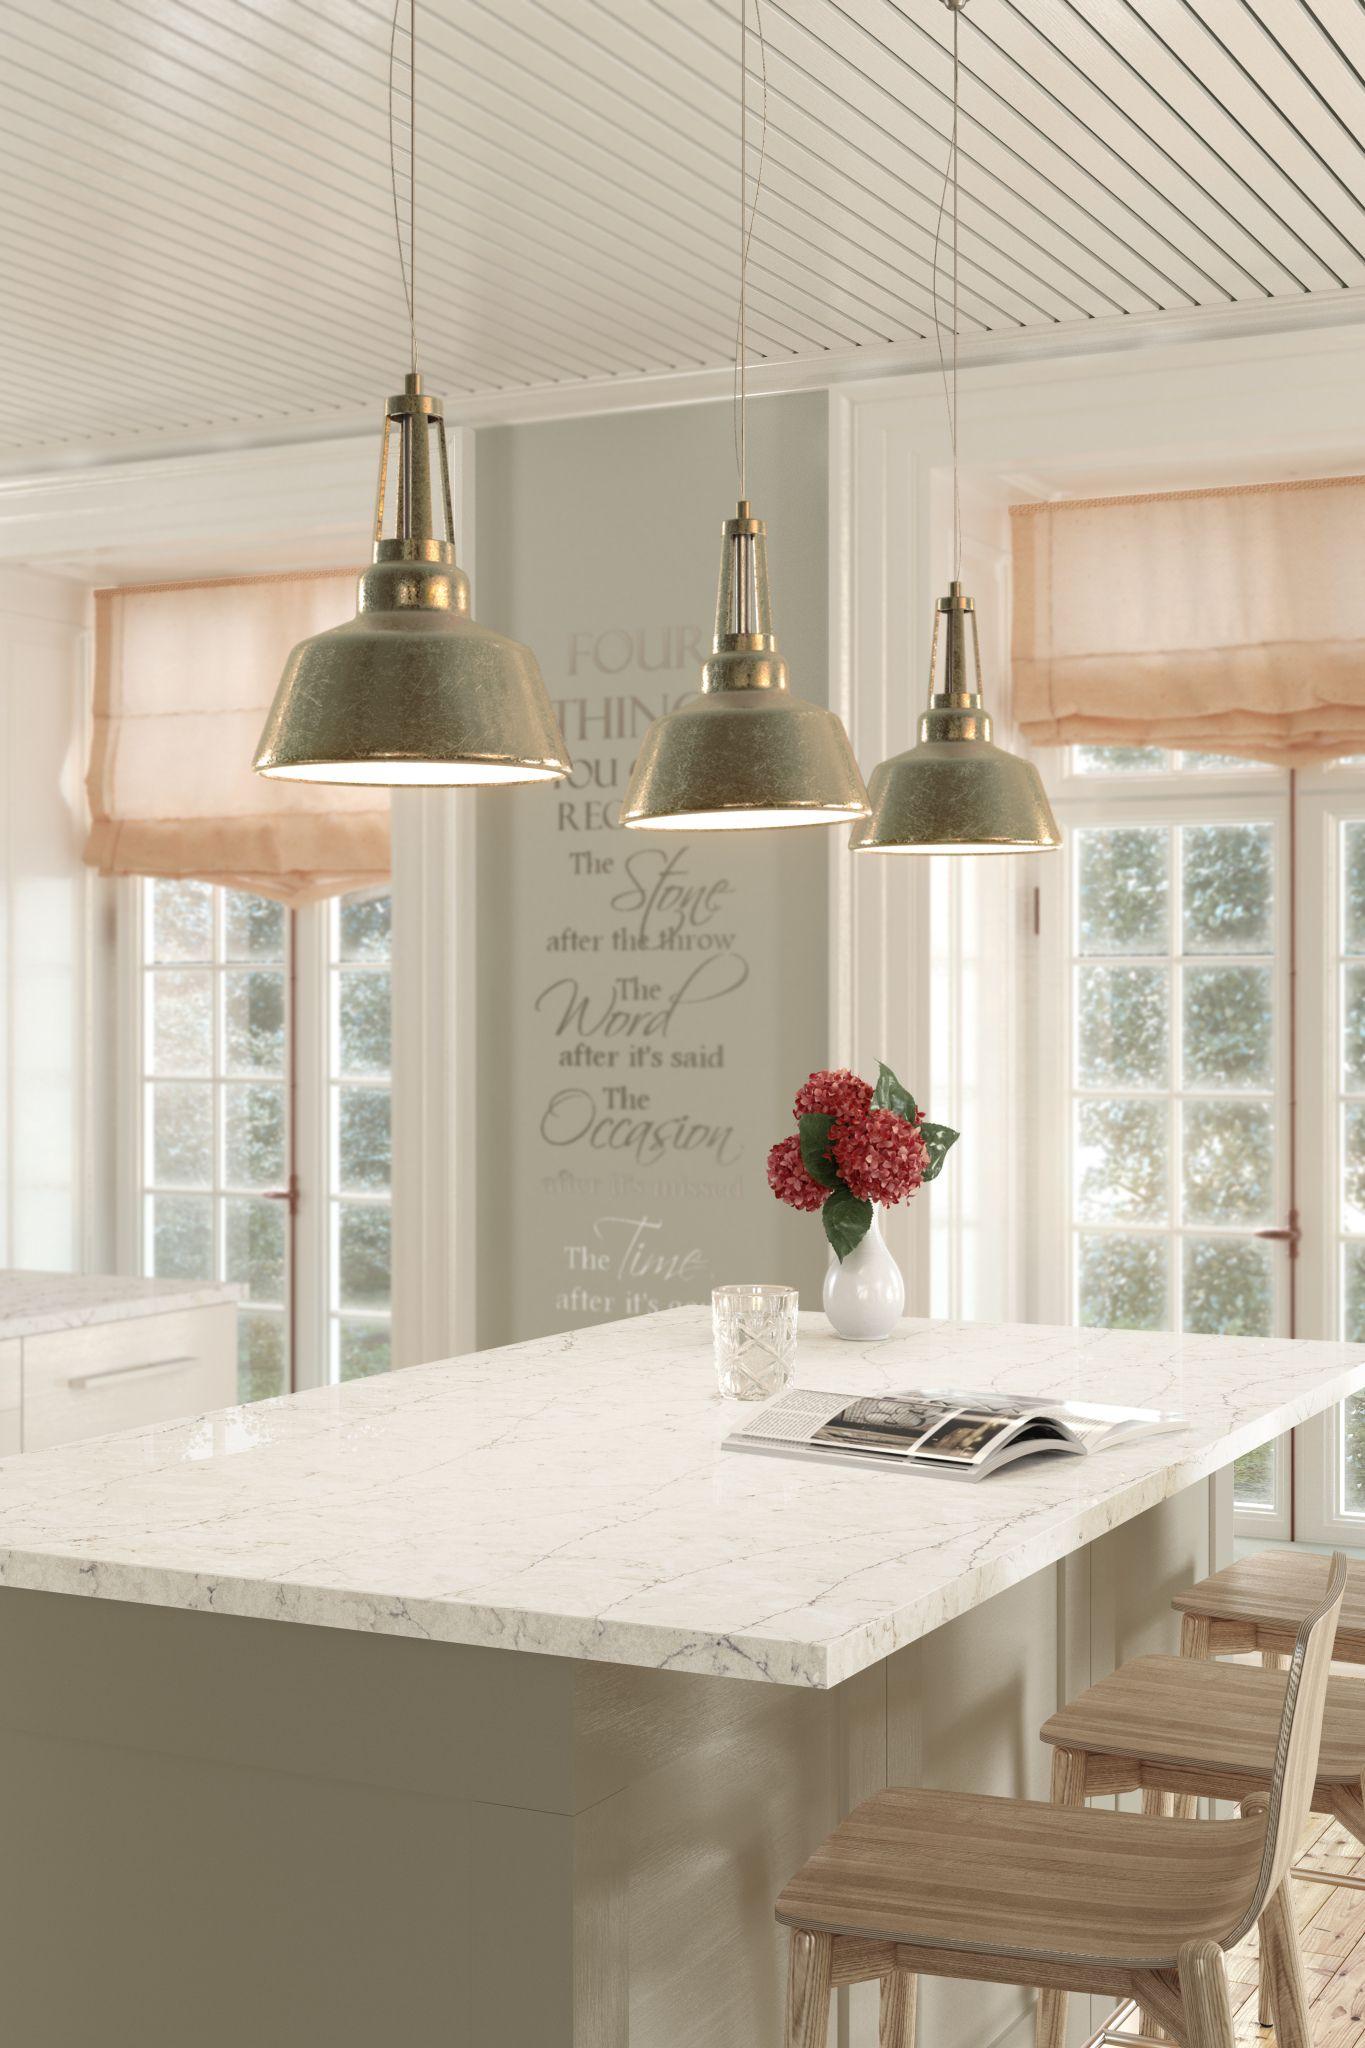 Isla de cocina en Silestone Eternal Pearl Jasmine